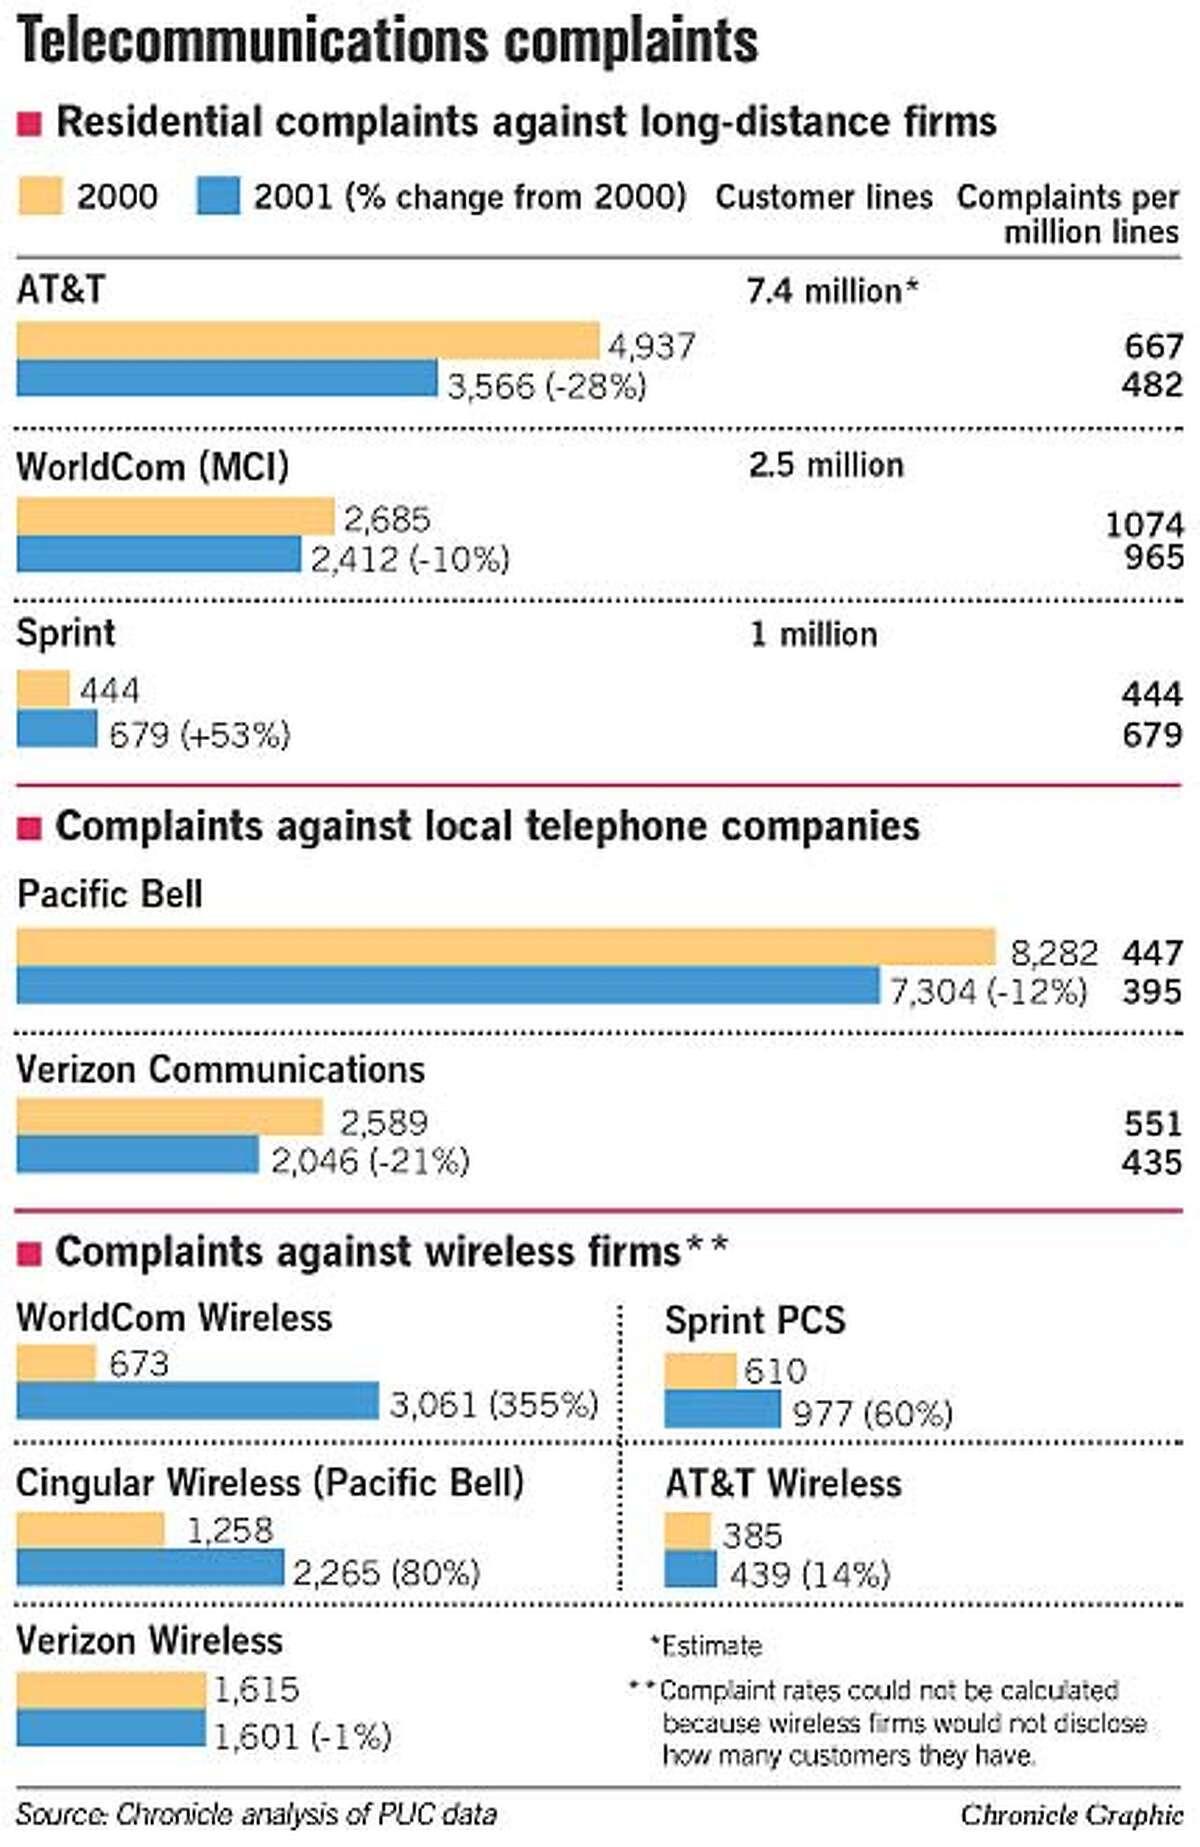 Telecommunications Complaints. Chronicle Graphic